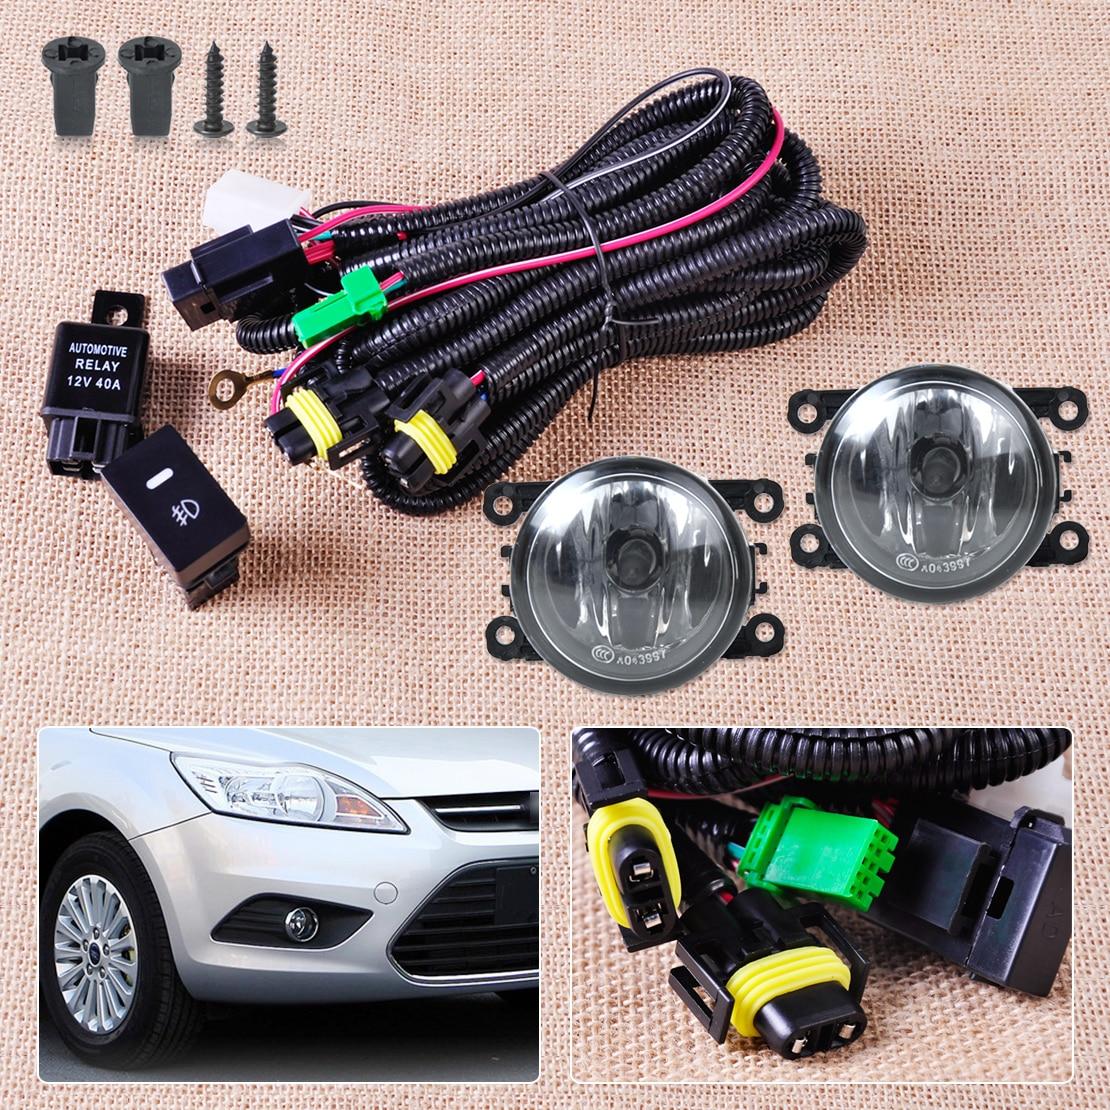 Wiring Harness Sockets Switch 2 H11 Fog font b Lights b font Lamp 4F9Z 15200 AA